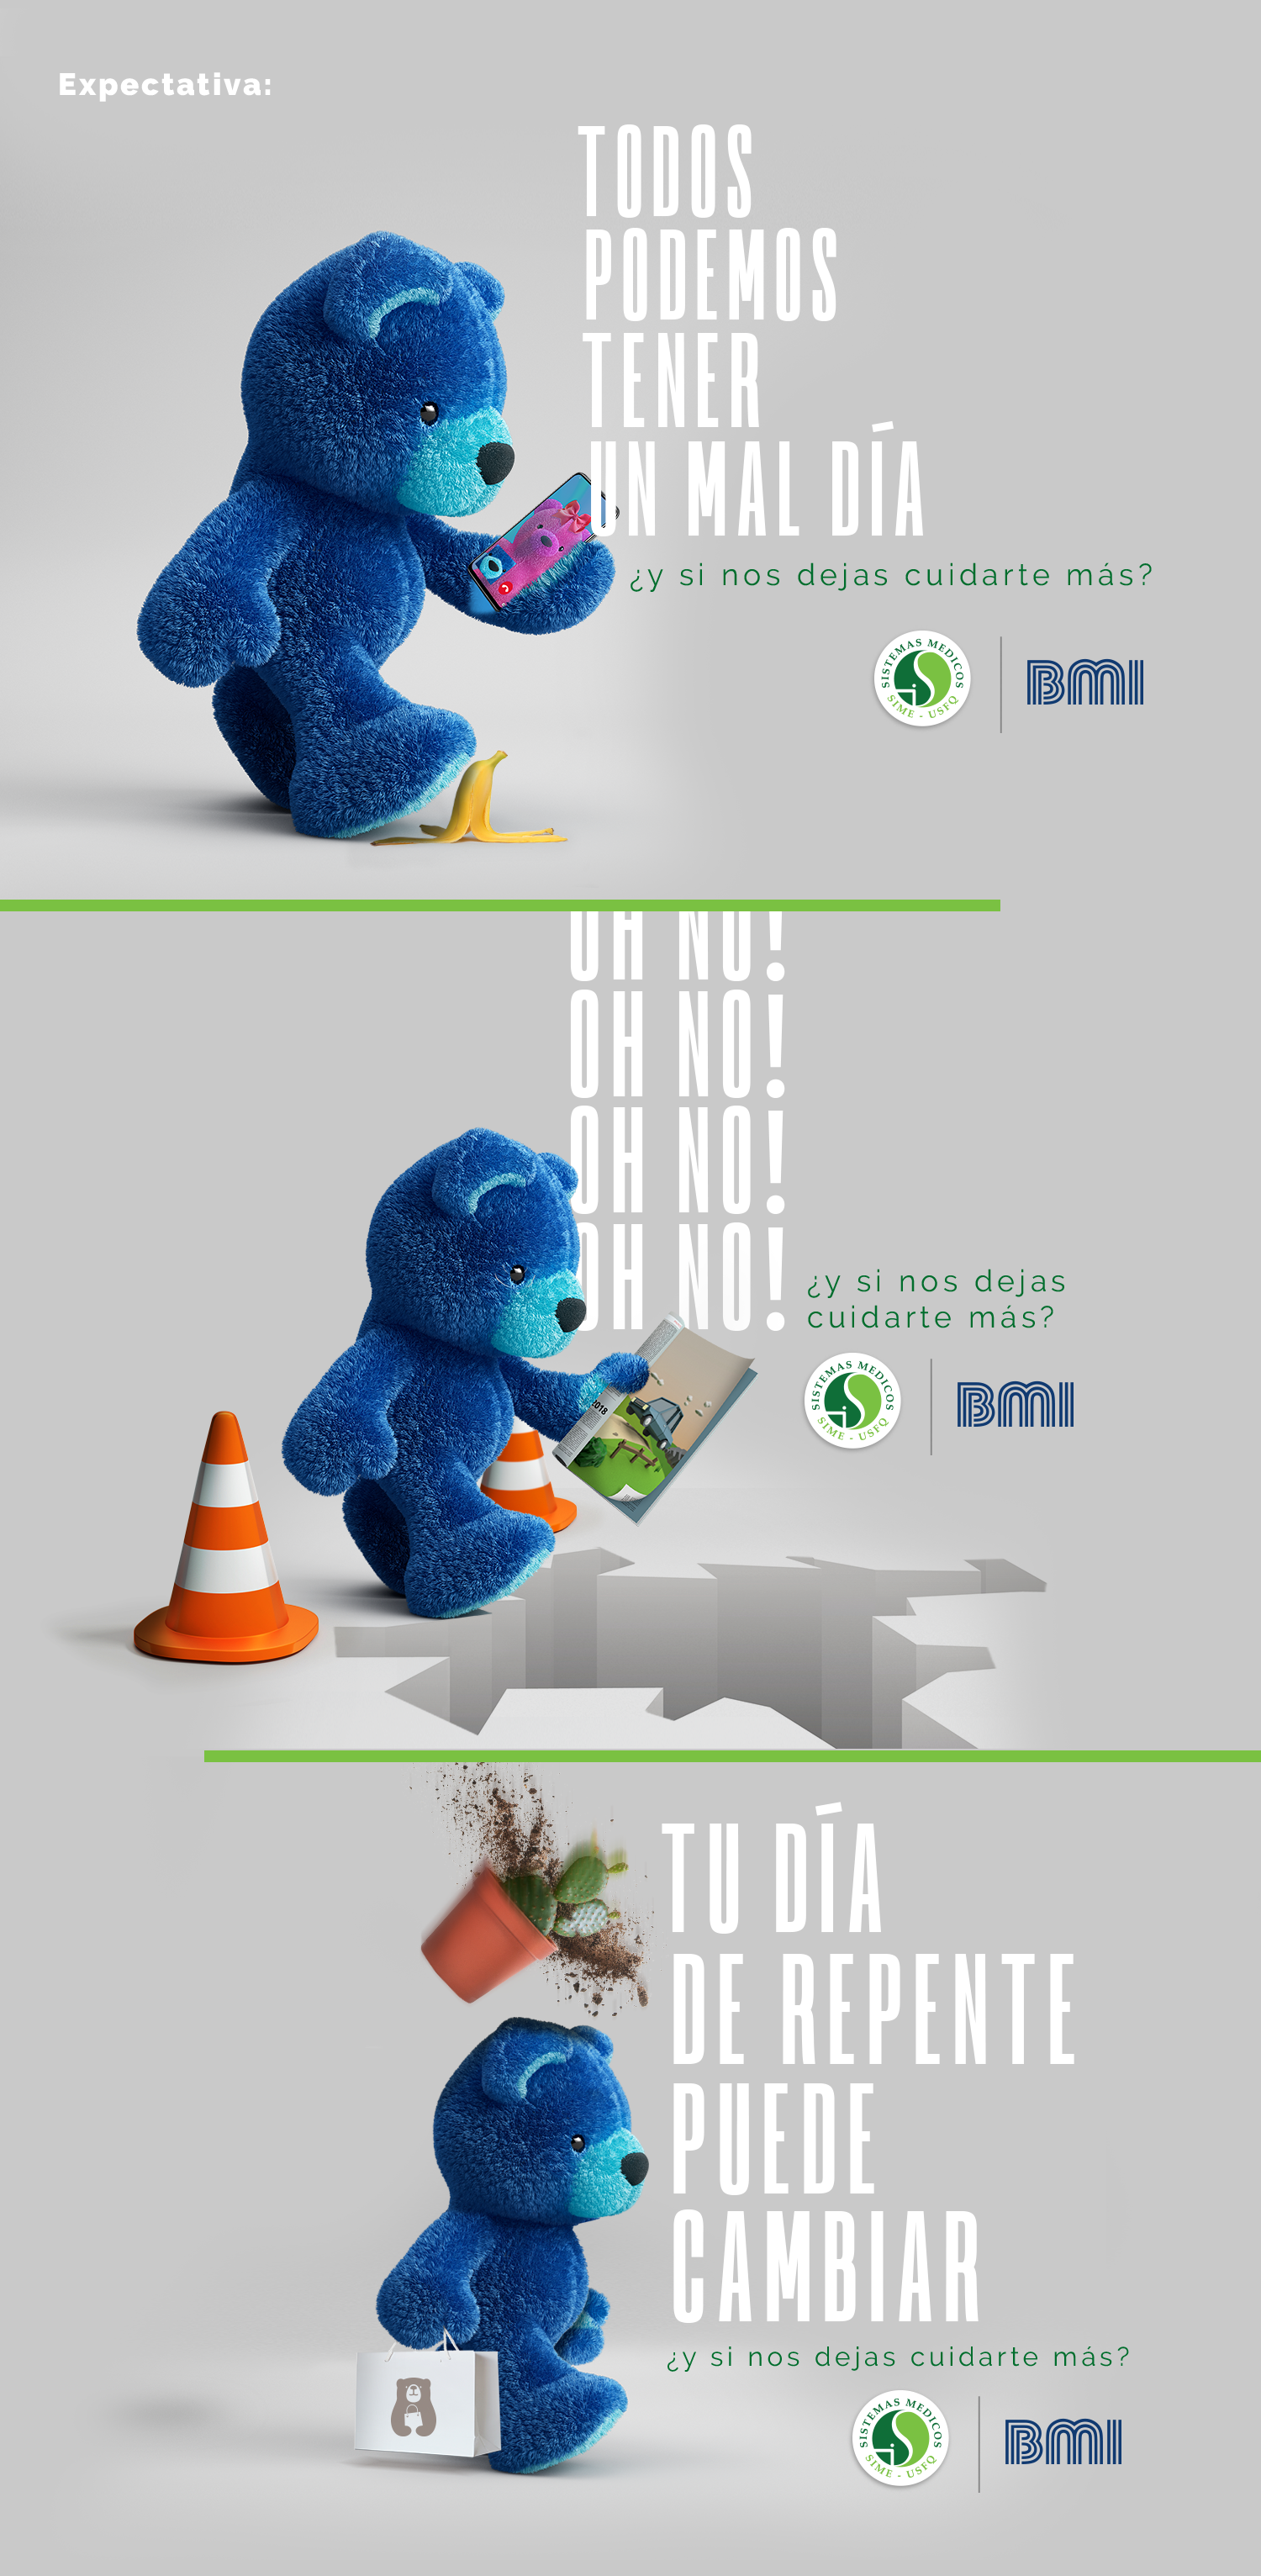 SIME USFQ – Bears